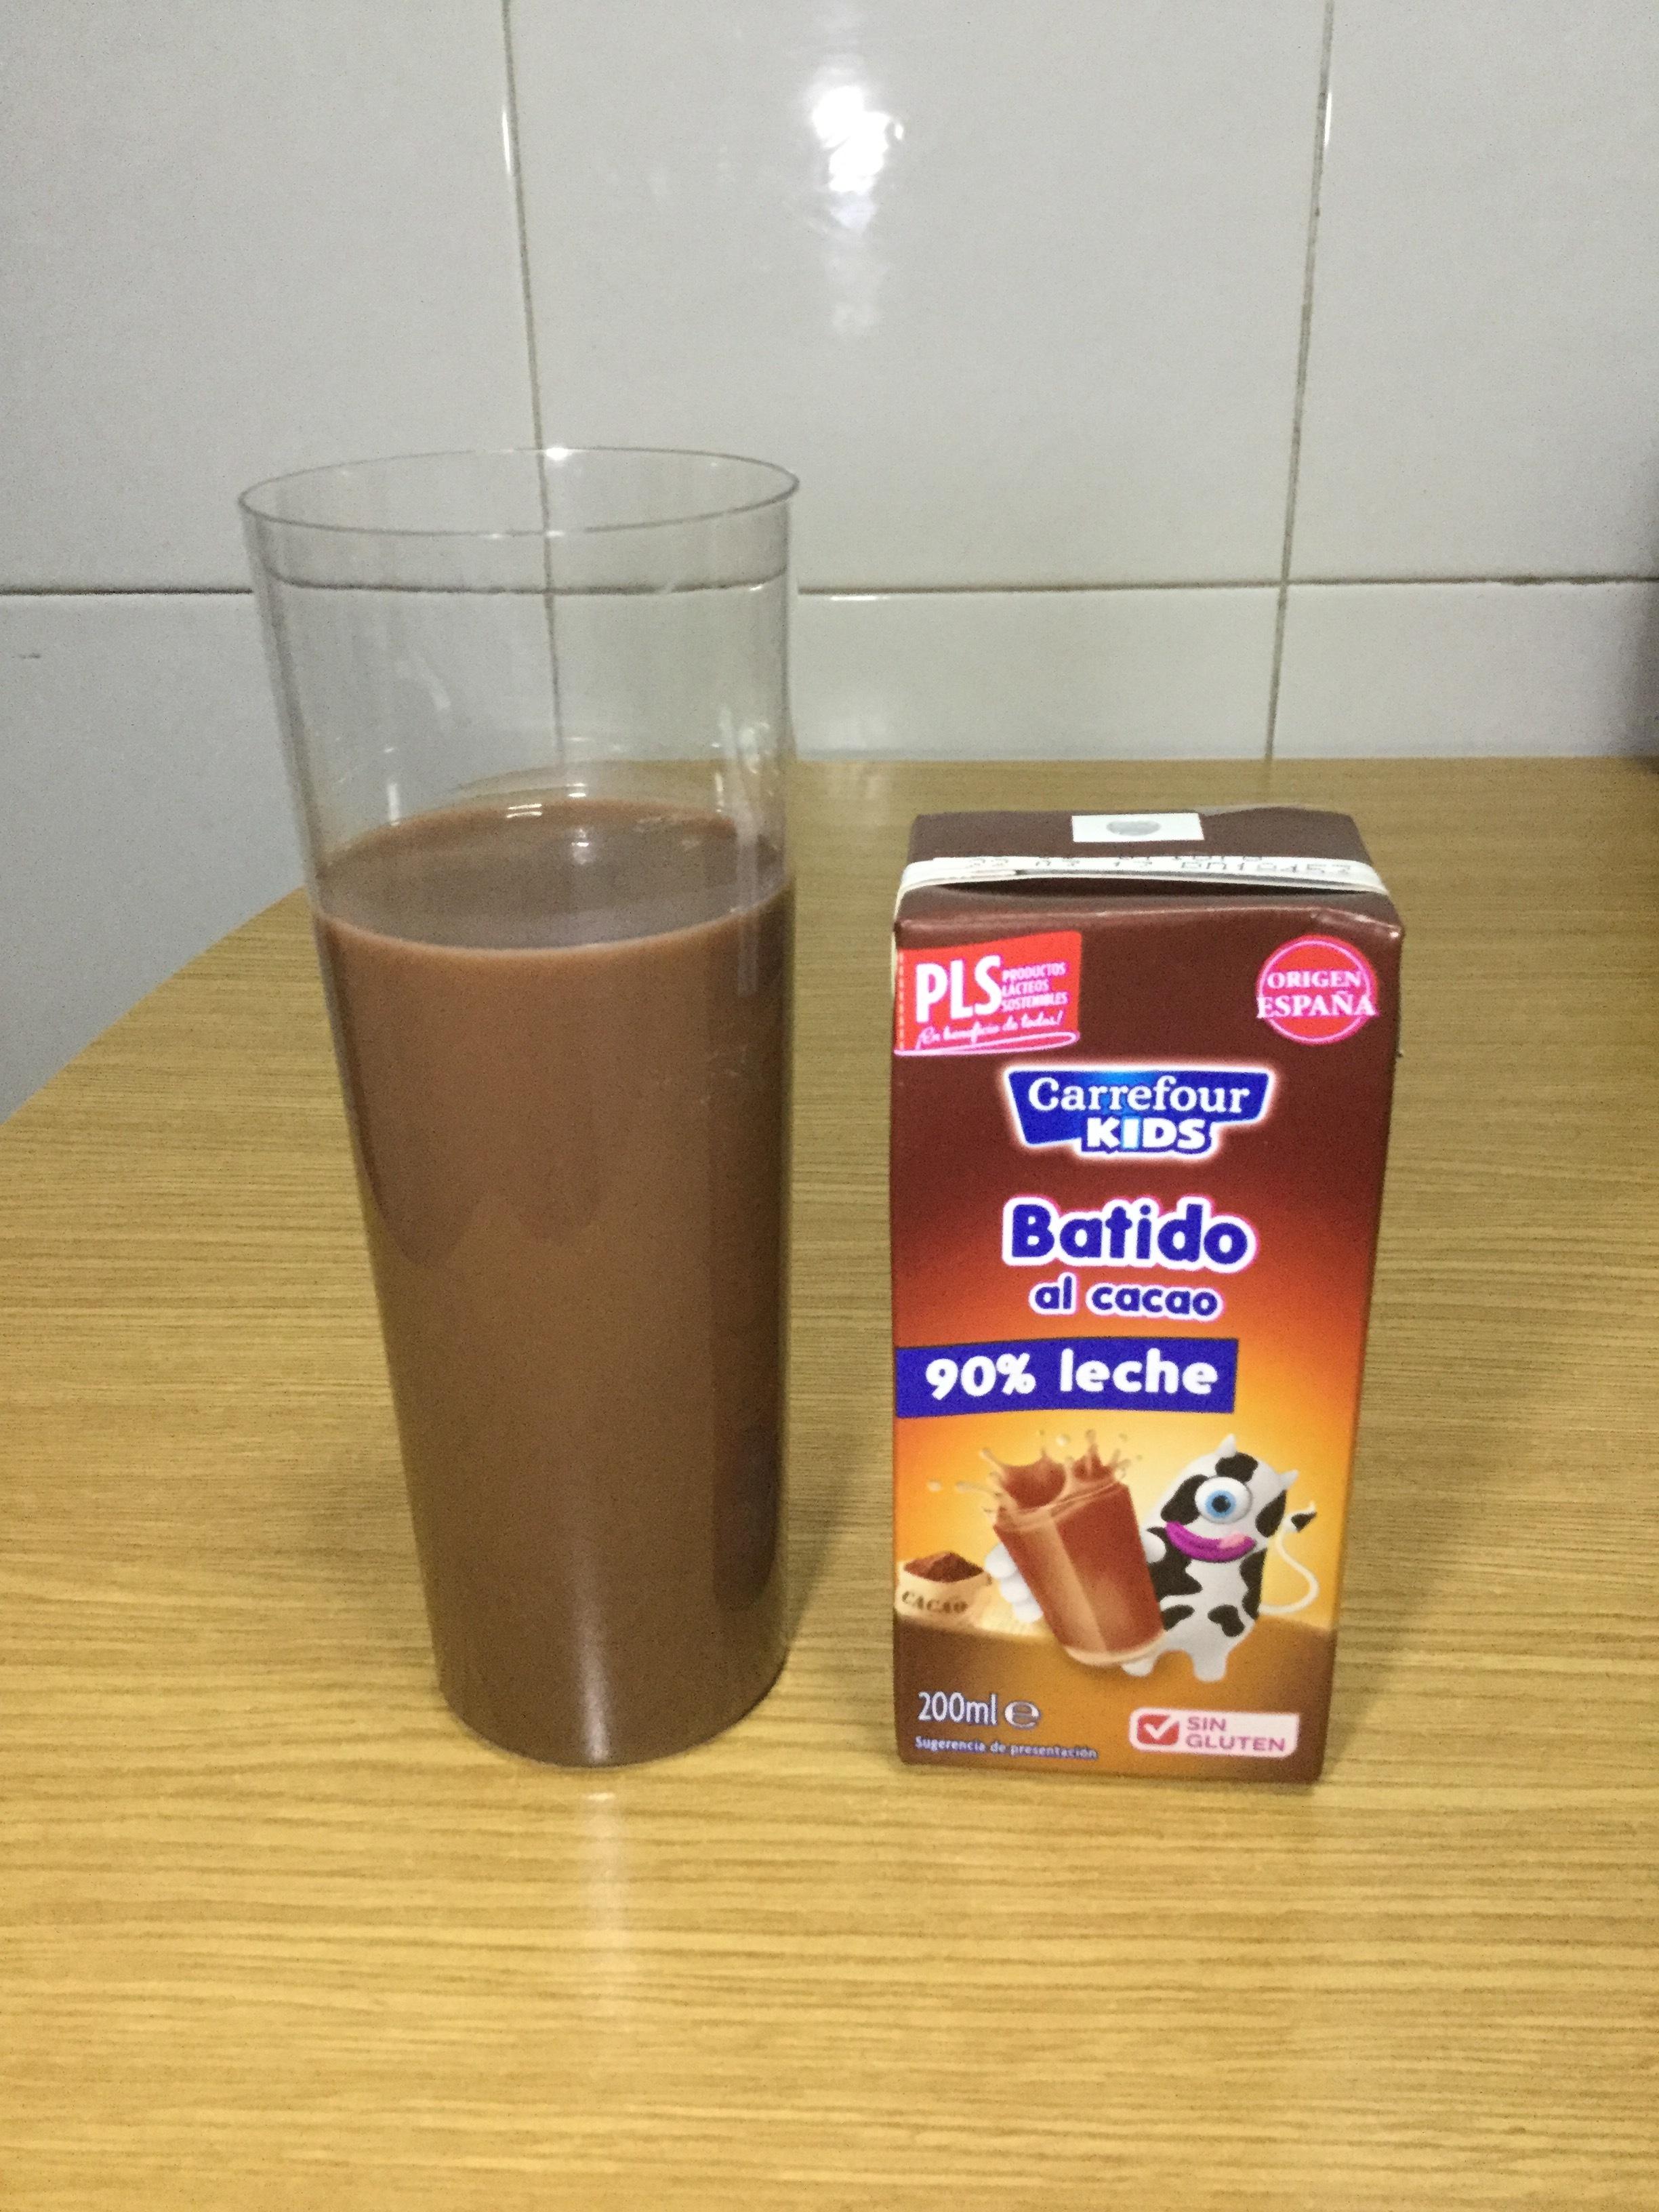 Carrefour Kids Batido Al Cacao Cup